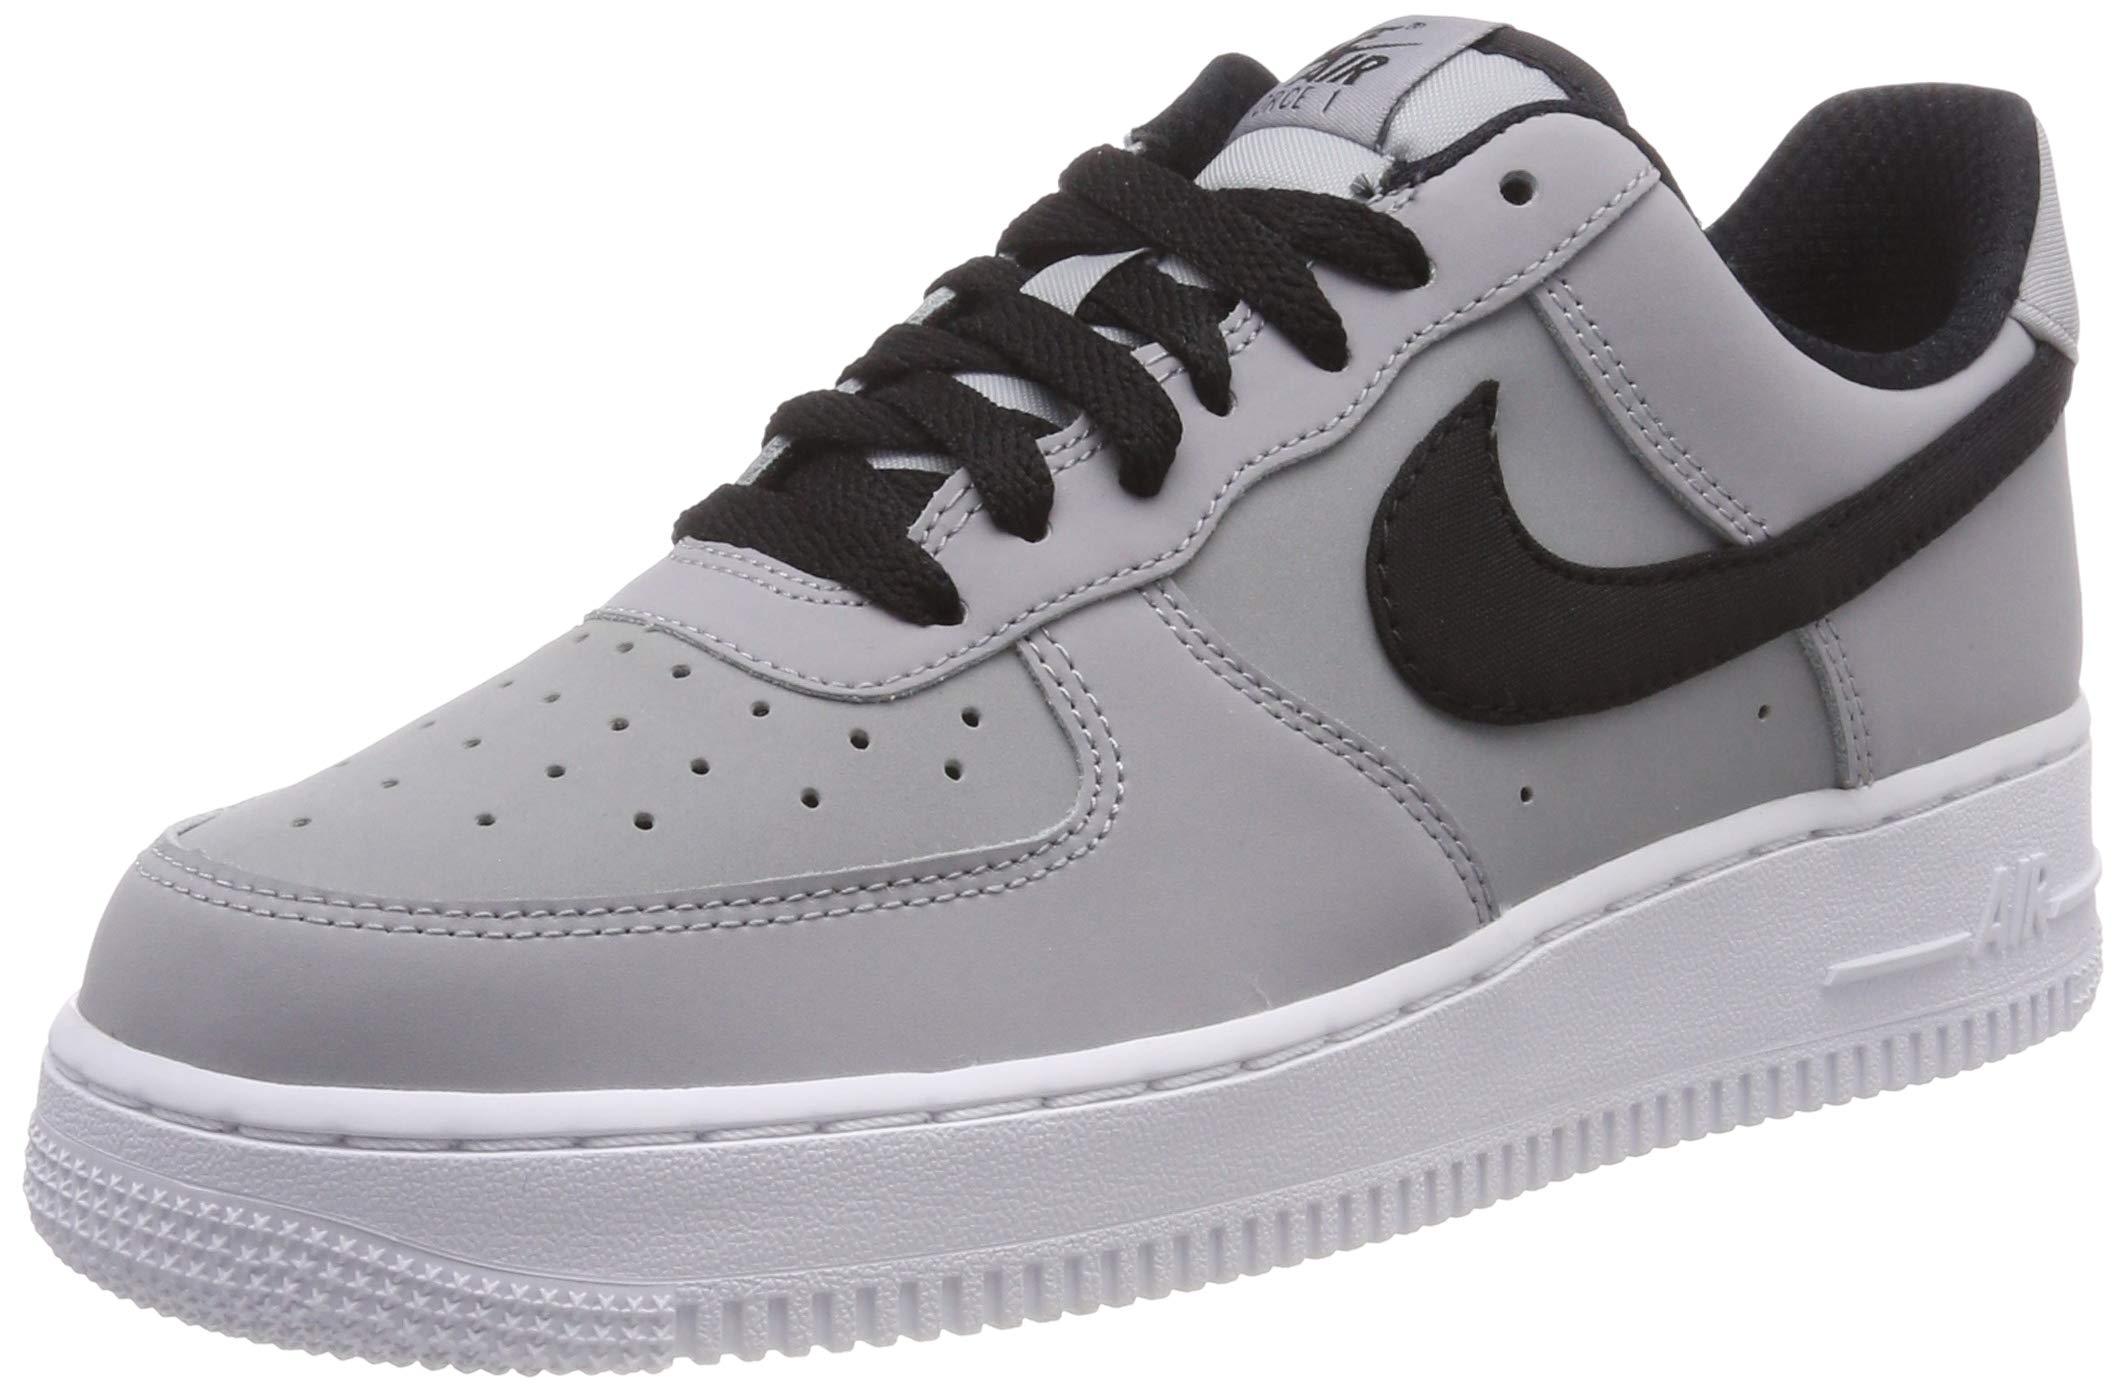 pretty nice 25222 e3446 Galleon - Nike Mens Air Force 1 Low Shoes Wolf Grey Black White AJ9502-001  Size 10.5